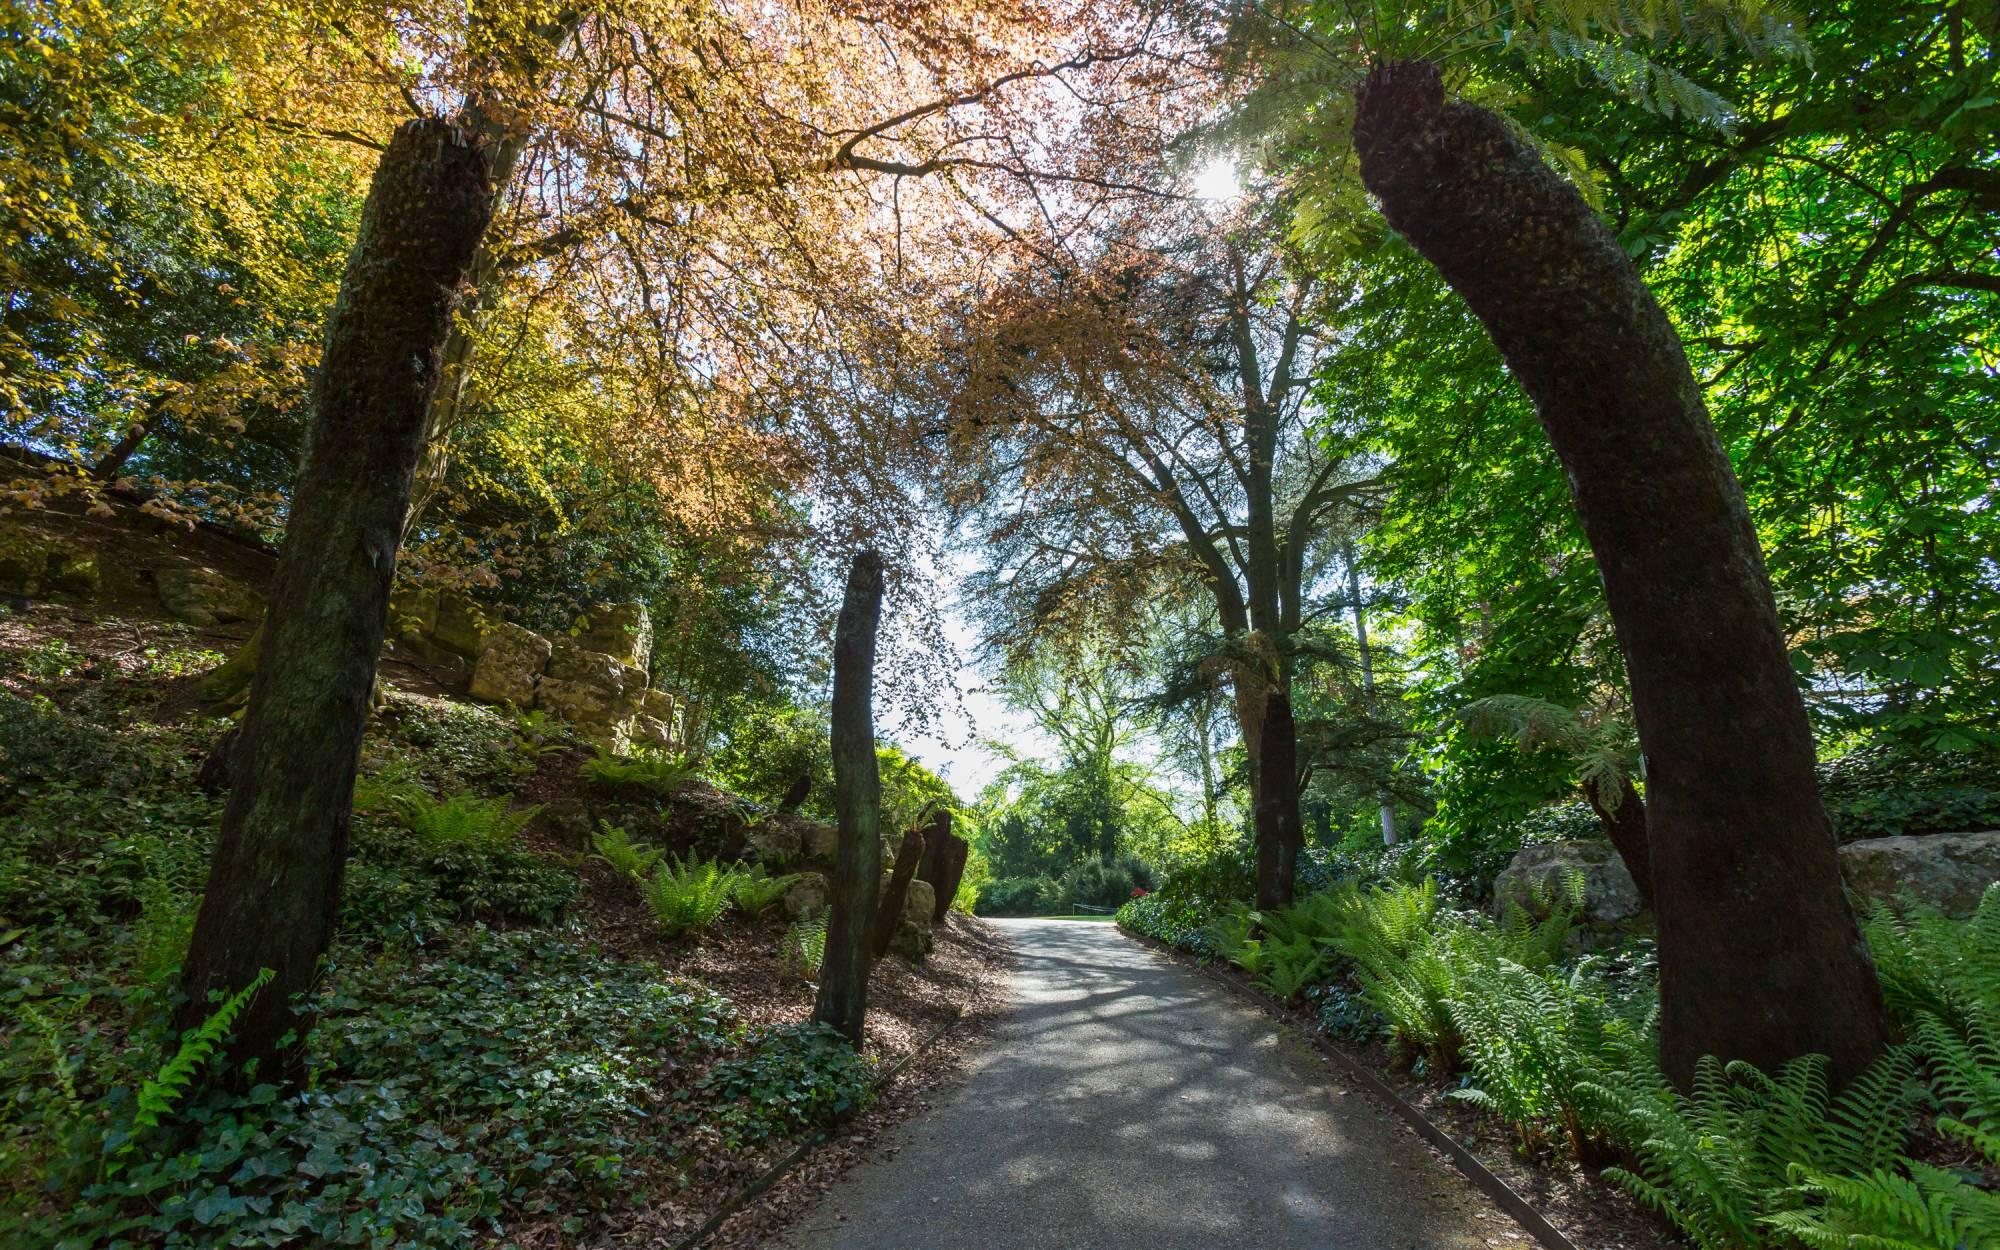 Tree ferns at Waddesdon Manor